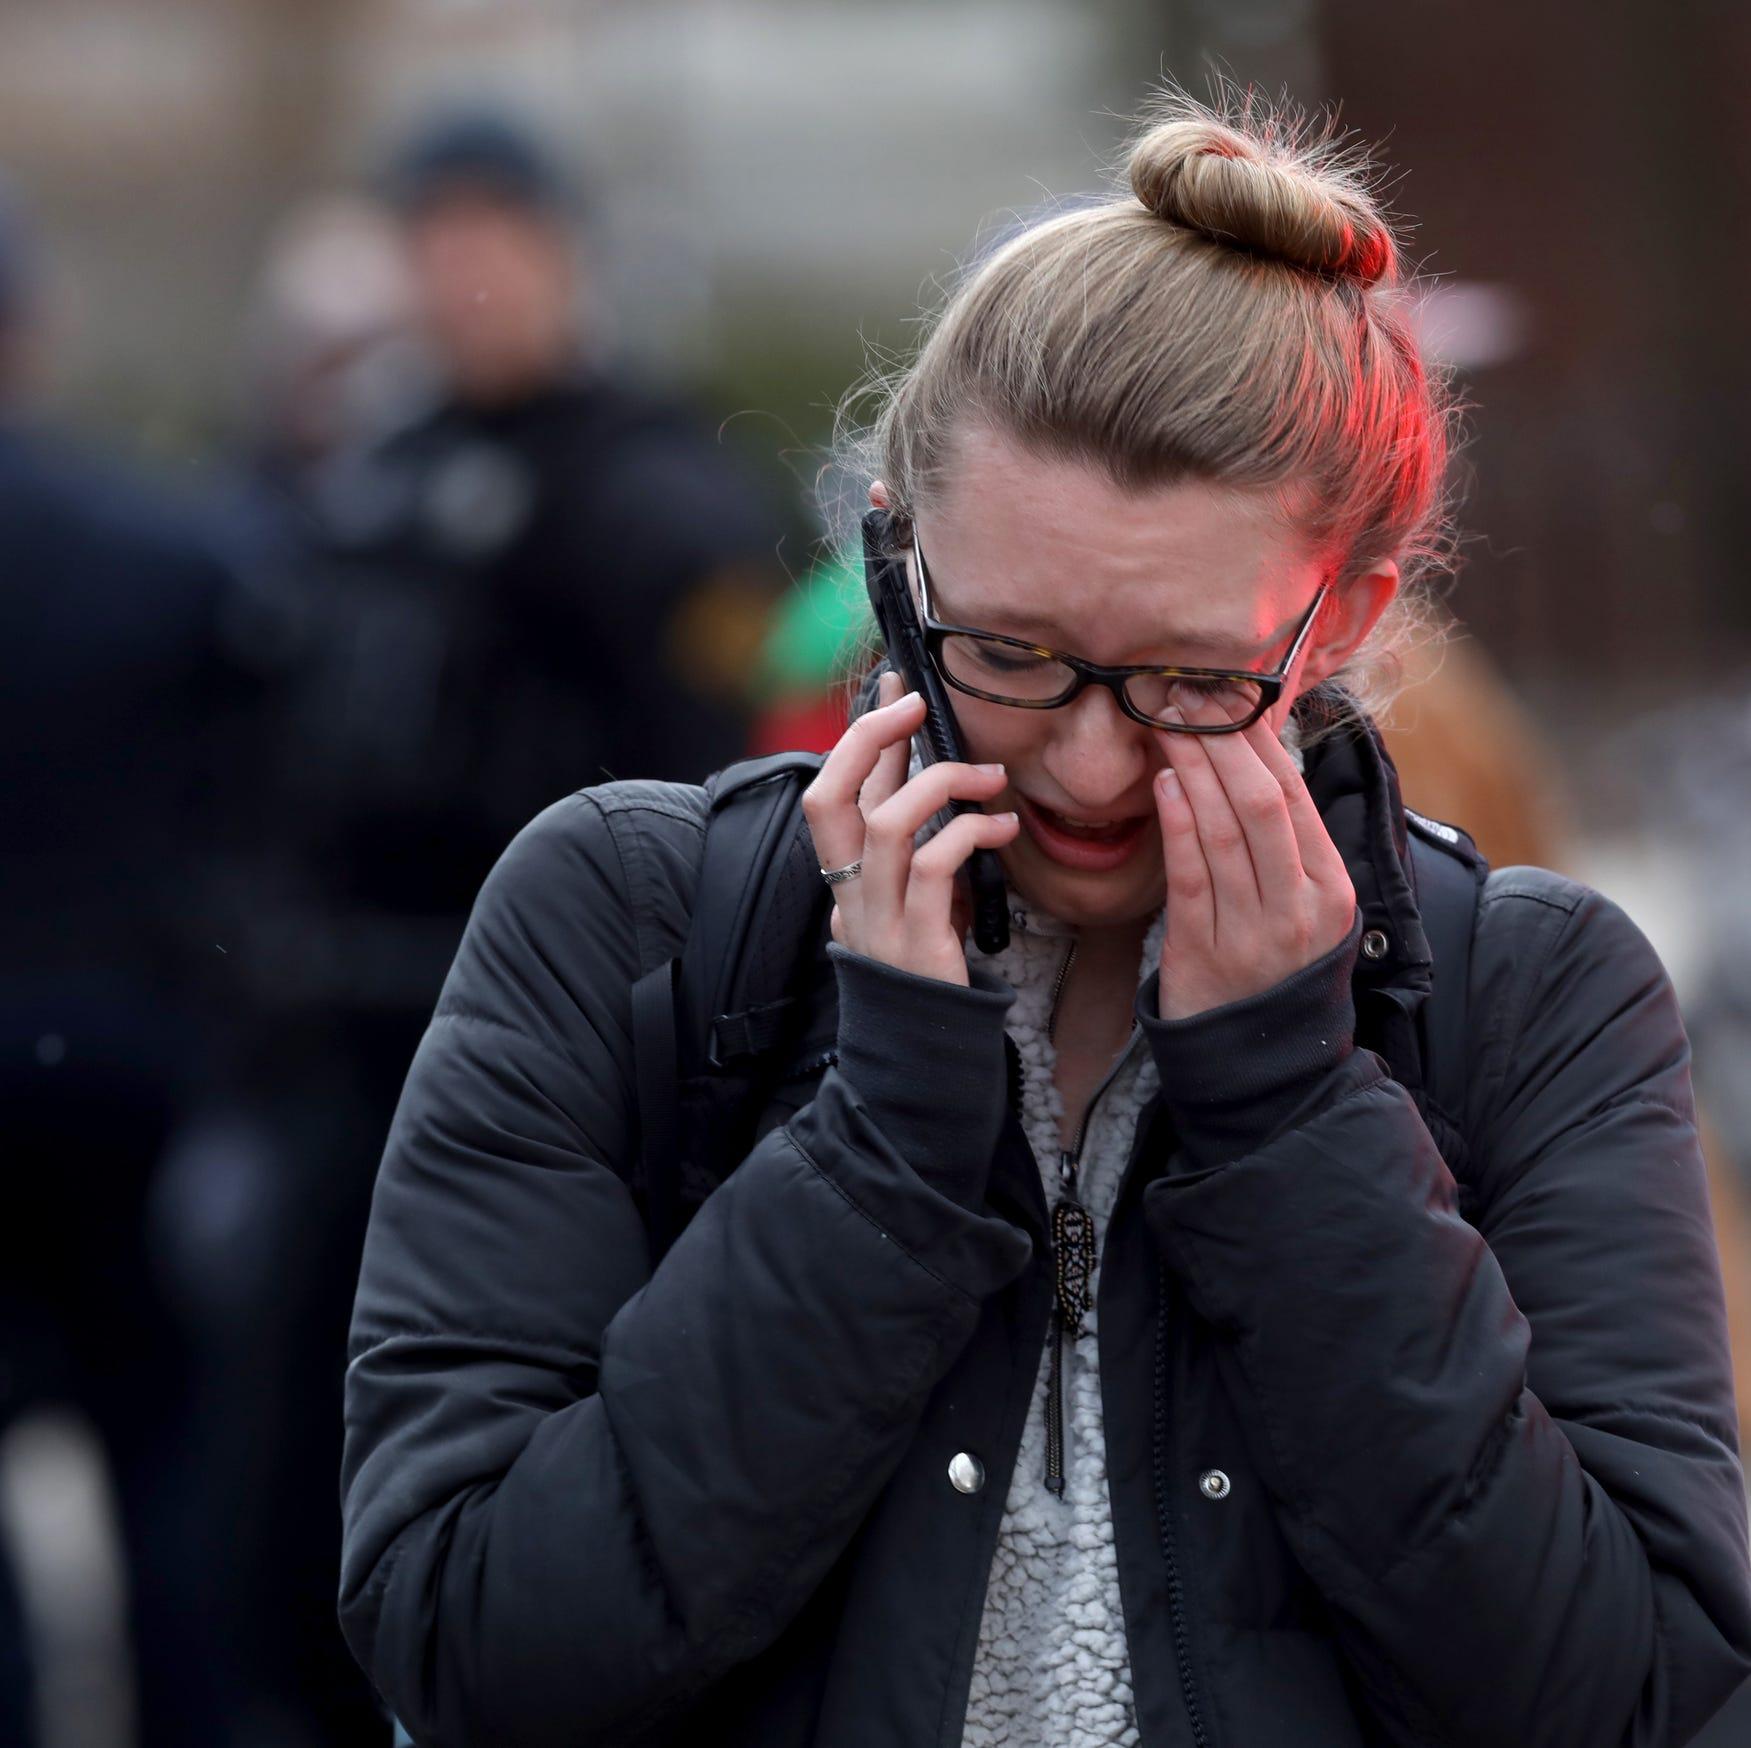 False active shooter reports spark high tension at University of Michigan